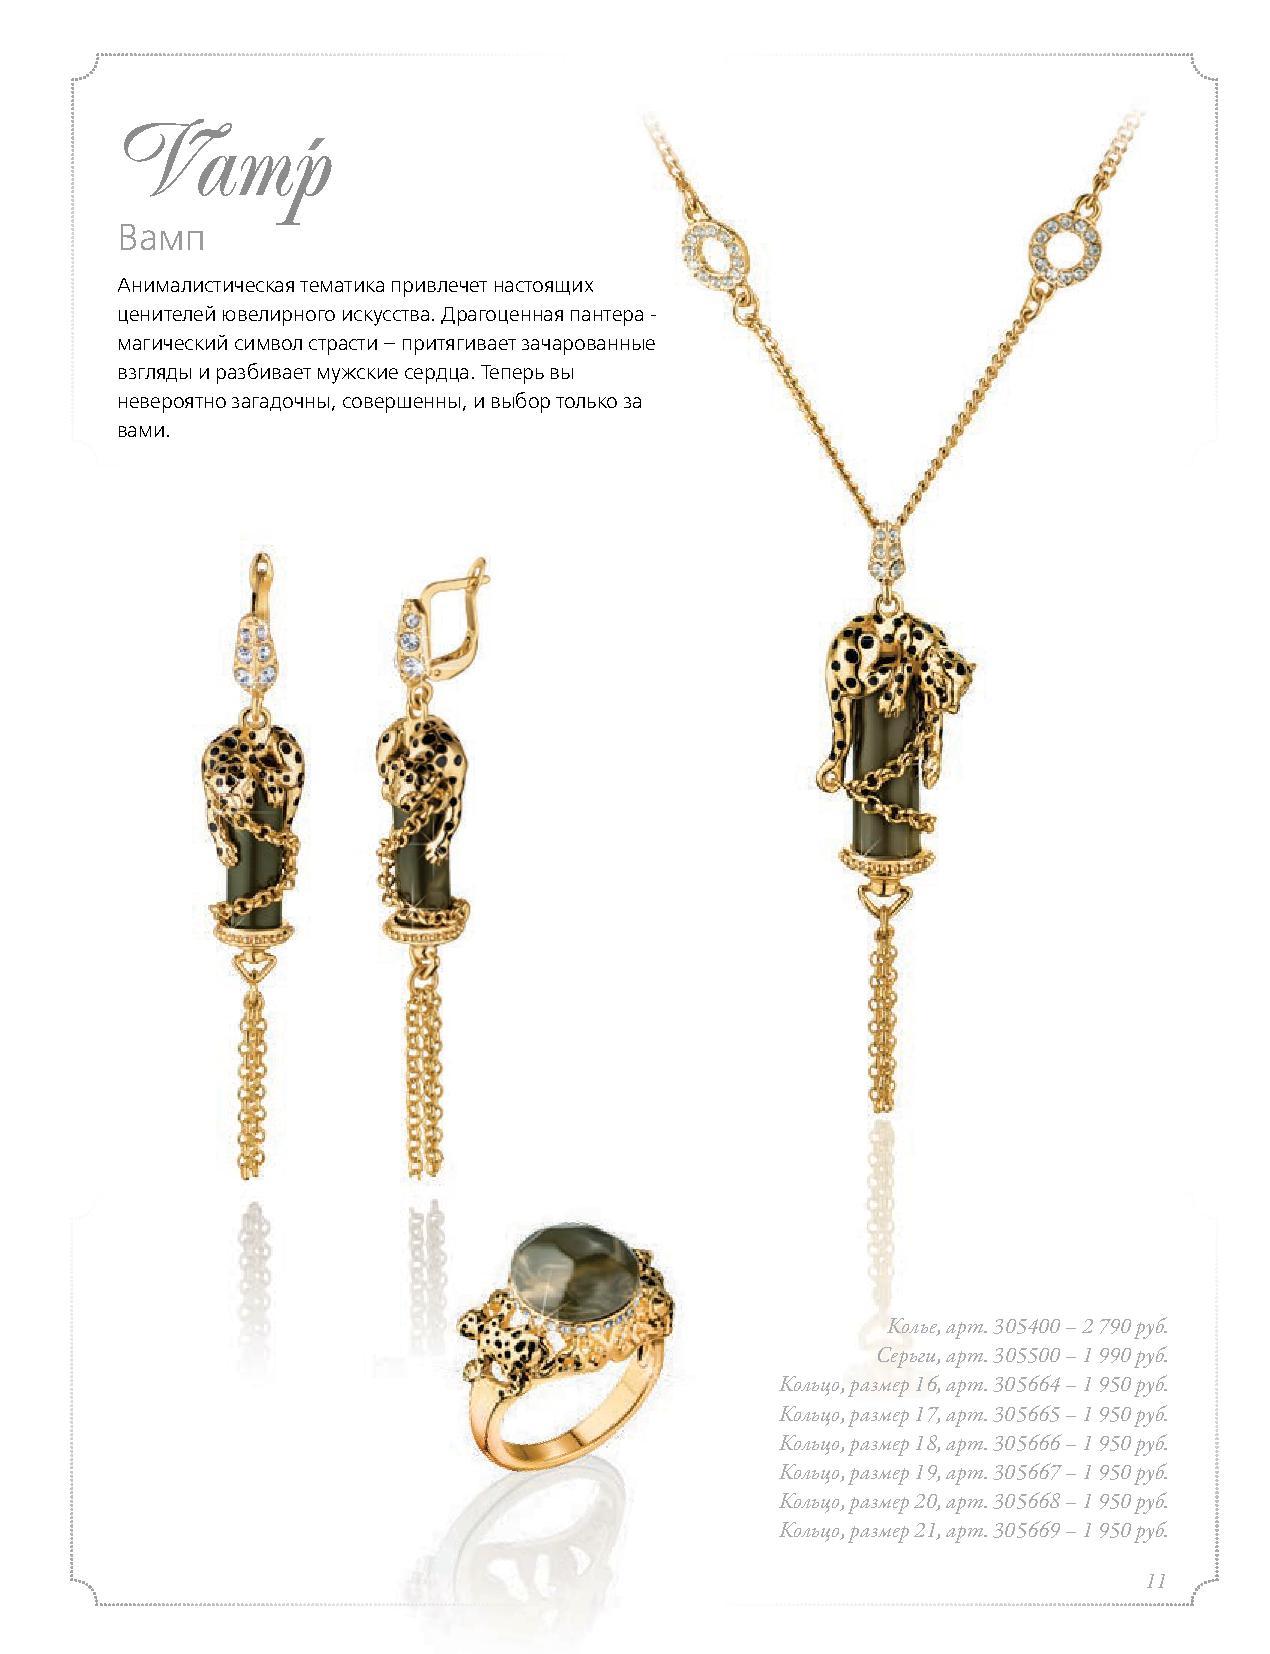 Флоранж комплект Вамп: колье, серьги, кольцо